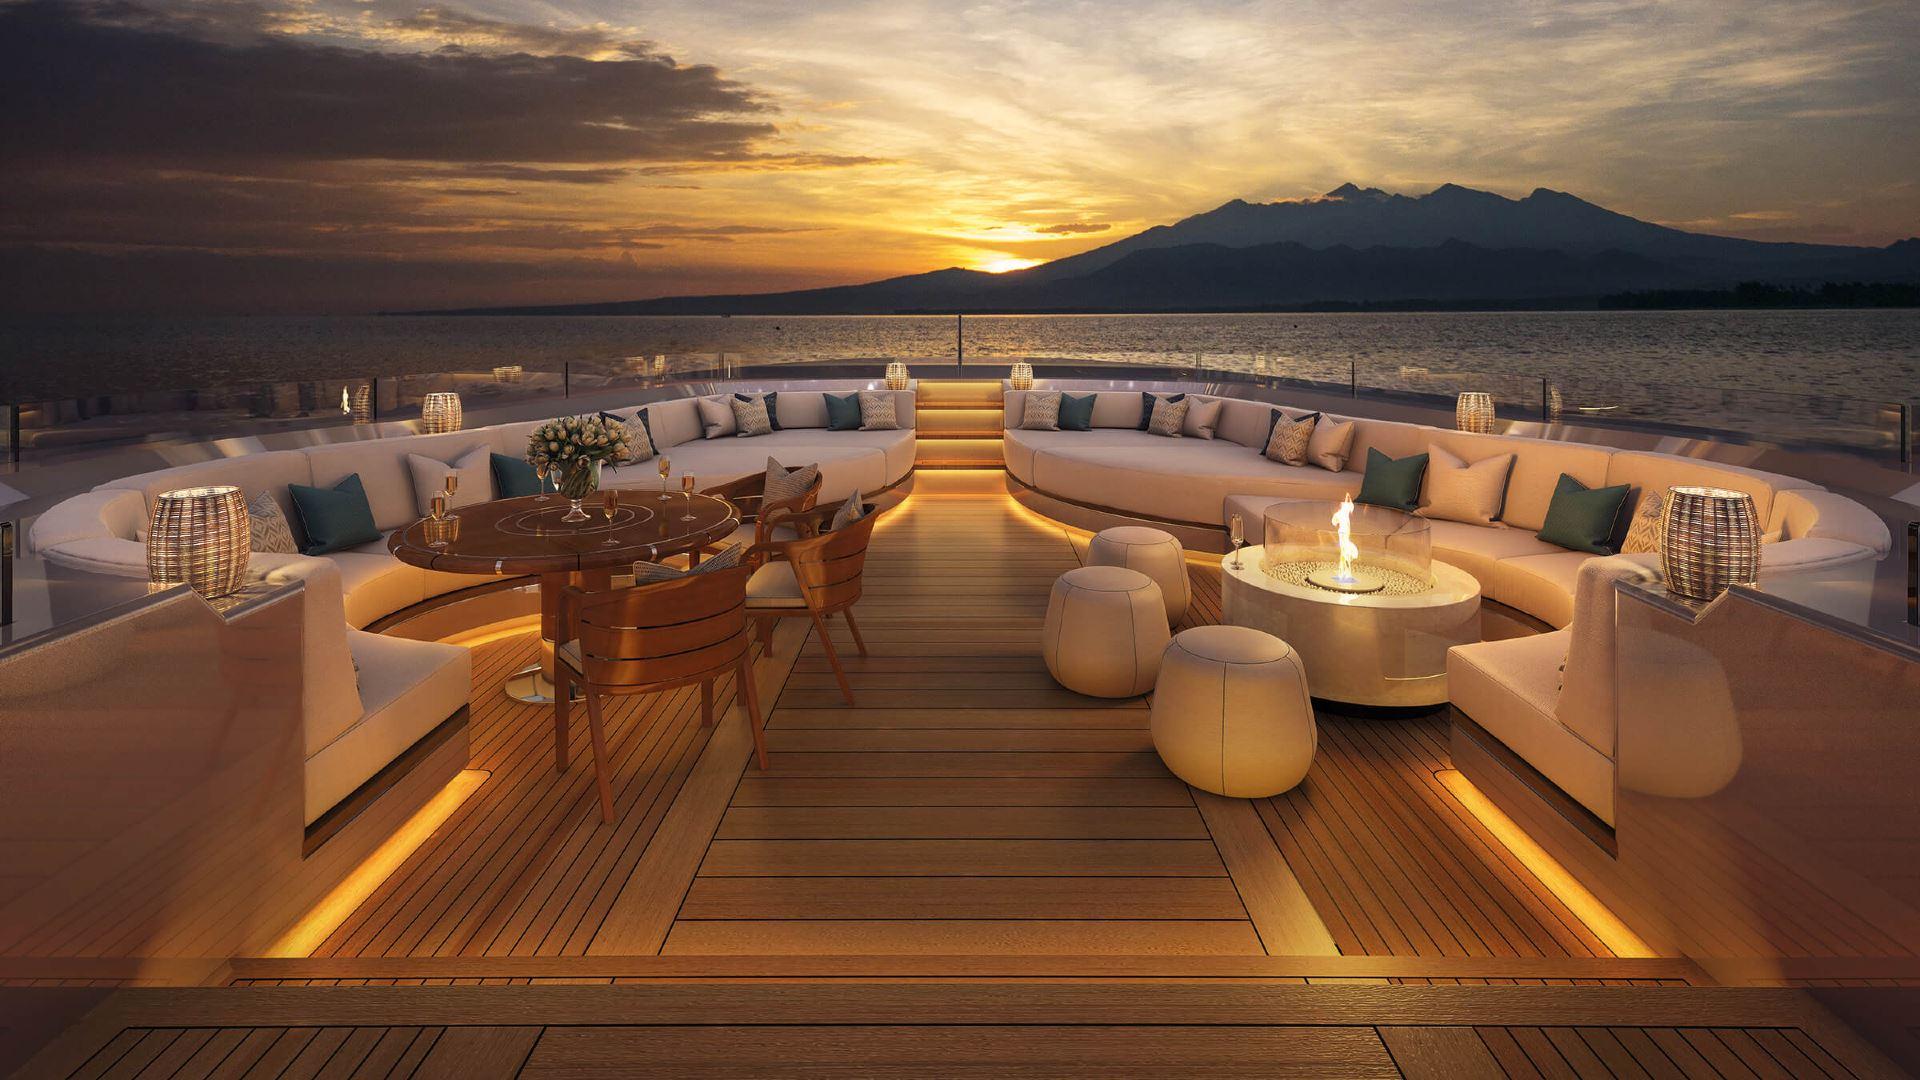 bnow68-owners-deck-nightedited